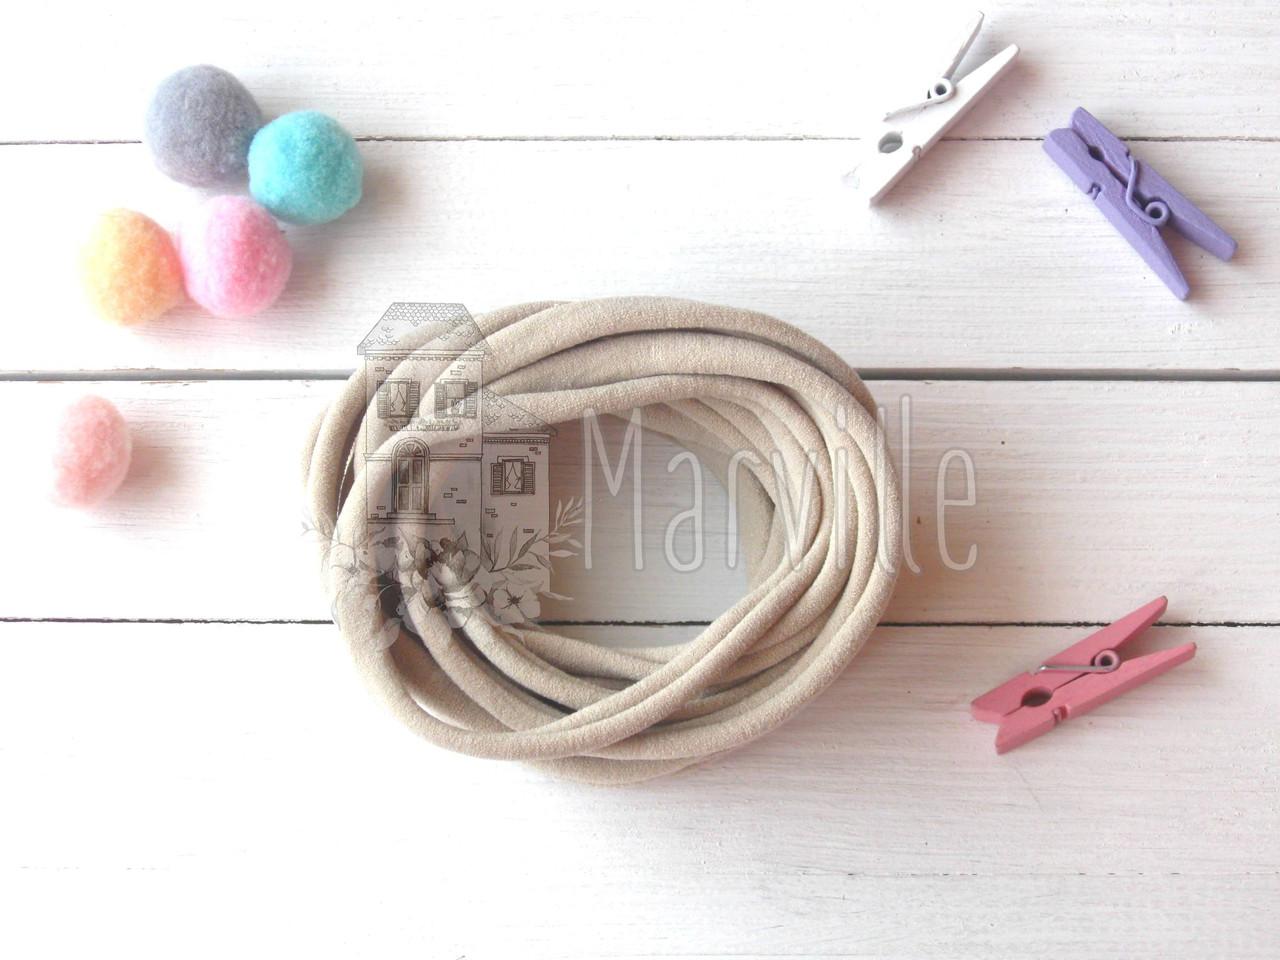 Резинка - повязка нейлоновая (one size) США Бежевая